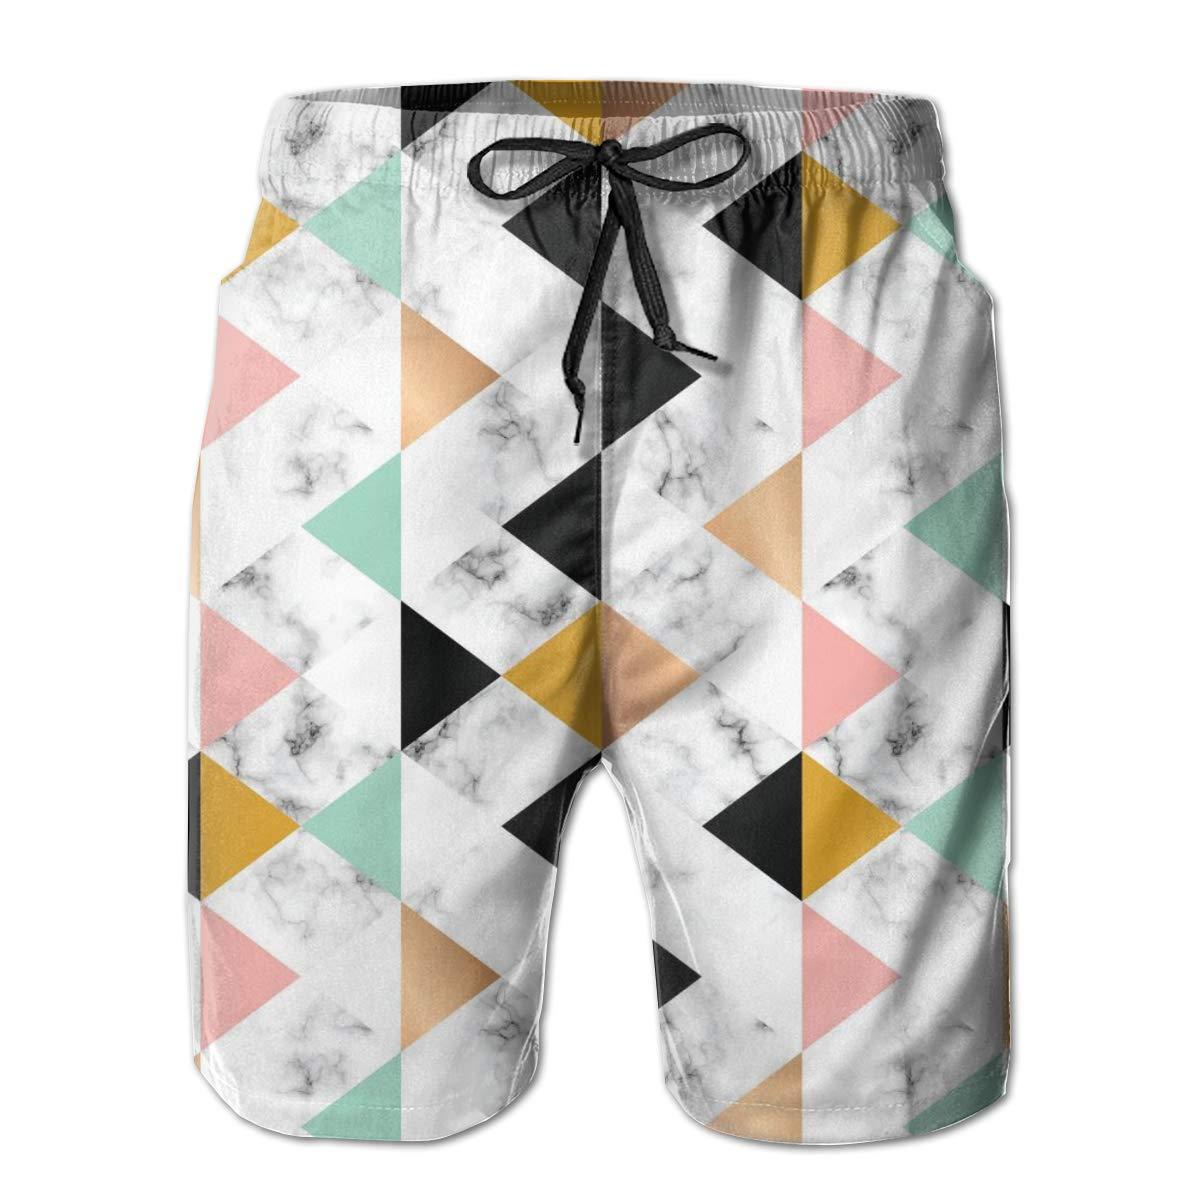 HZamora/_H Men Marble Texture Golden Geometric Summer Breathable Quick-Drying Swim Trunks Beach Shorts Board Shorts